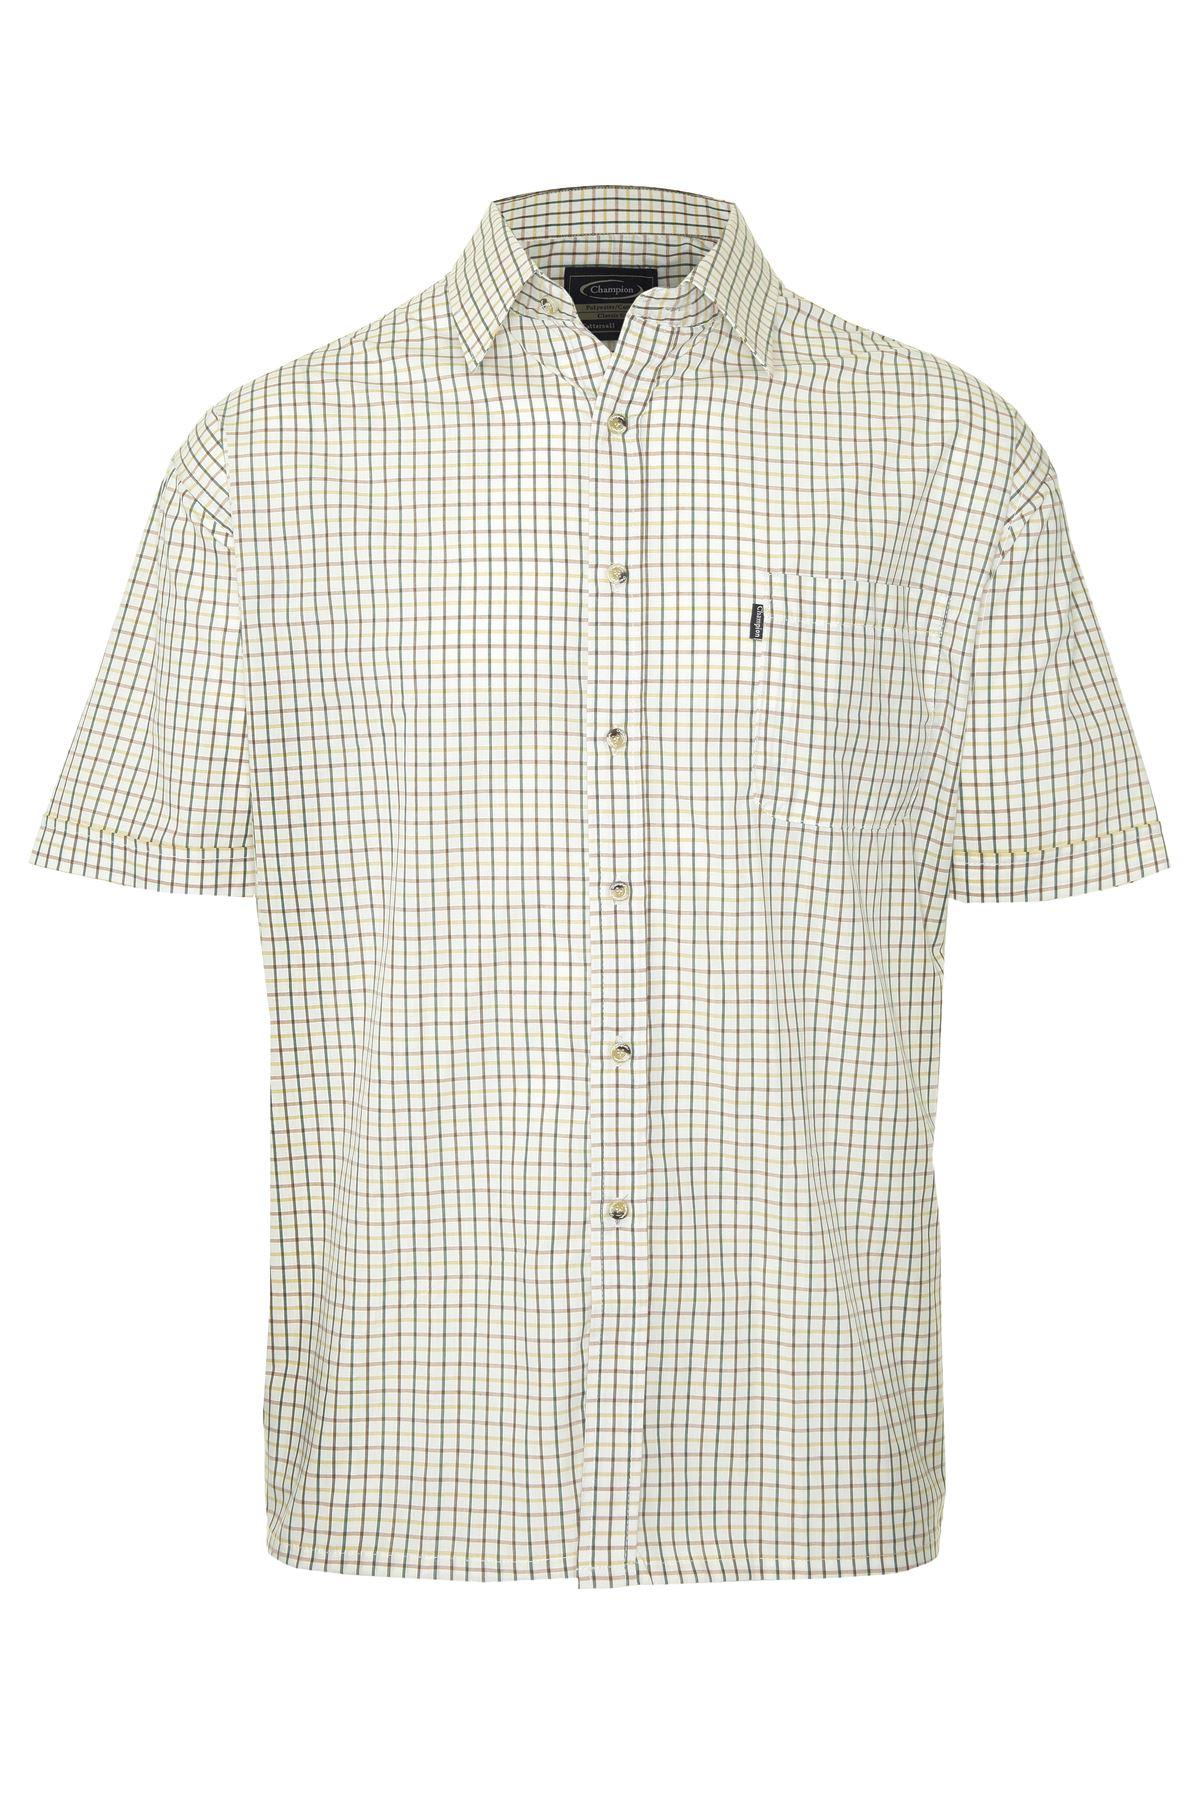 Champion-Mens-Shirt-Check-Short-Sleeve-Polycotton-Country-Casual thumbnail 5